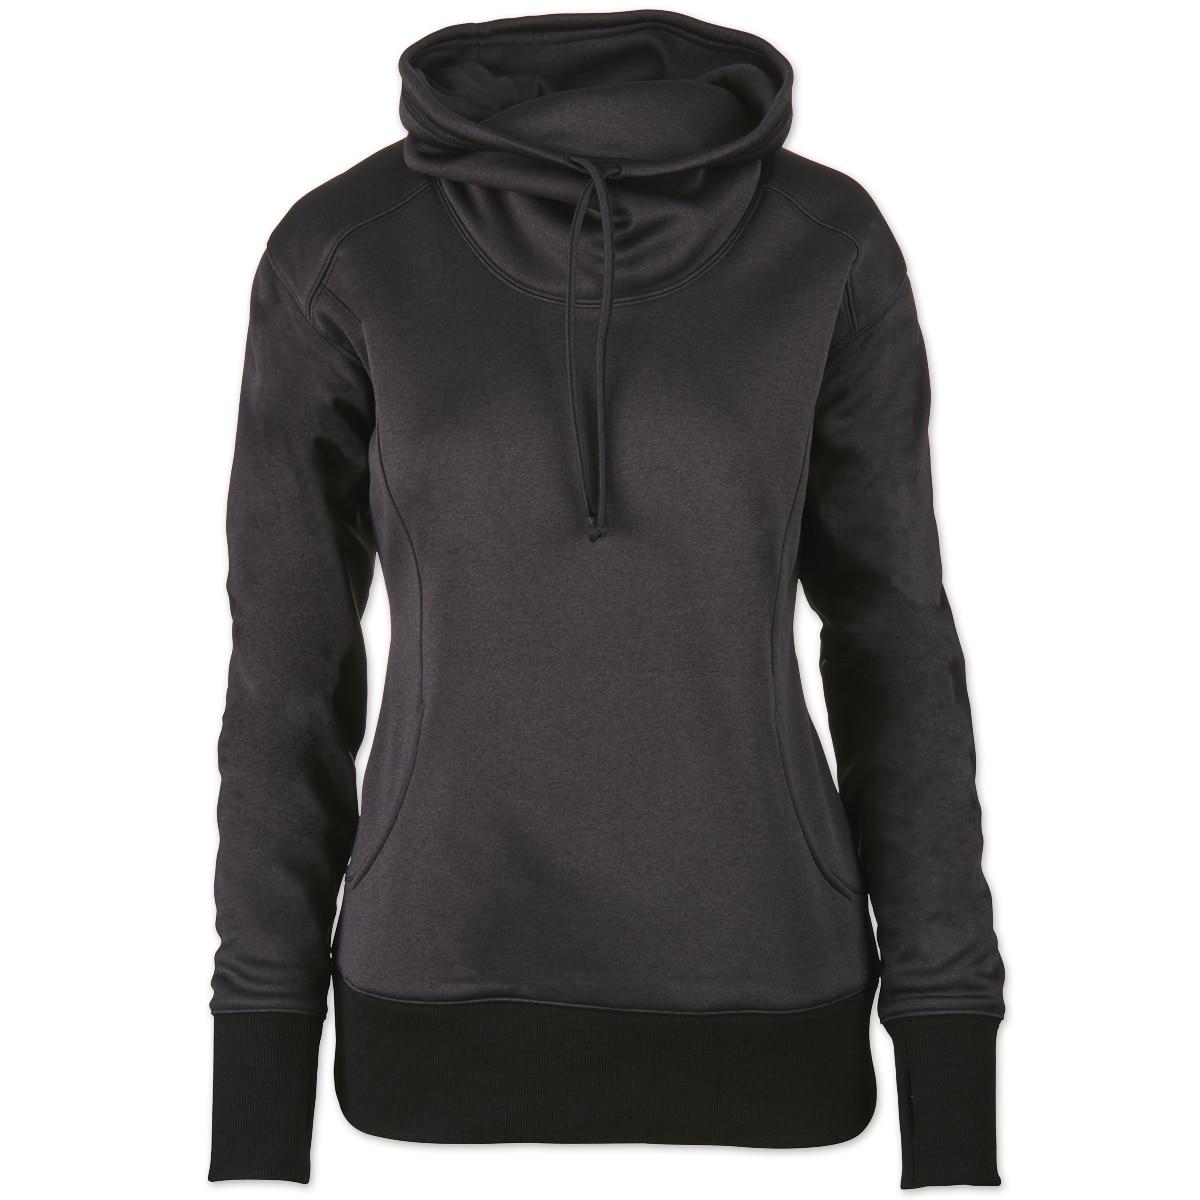 03da1c533211 Piper Cowl Neck Sweatshirt